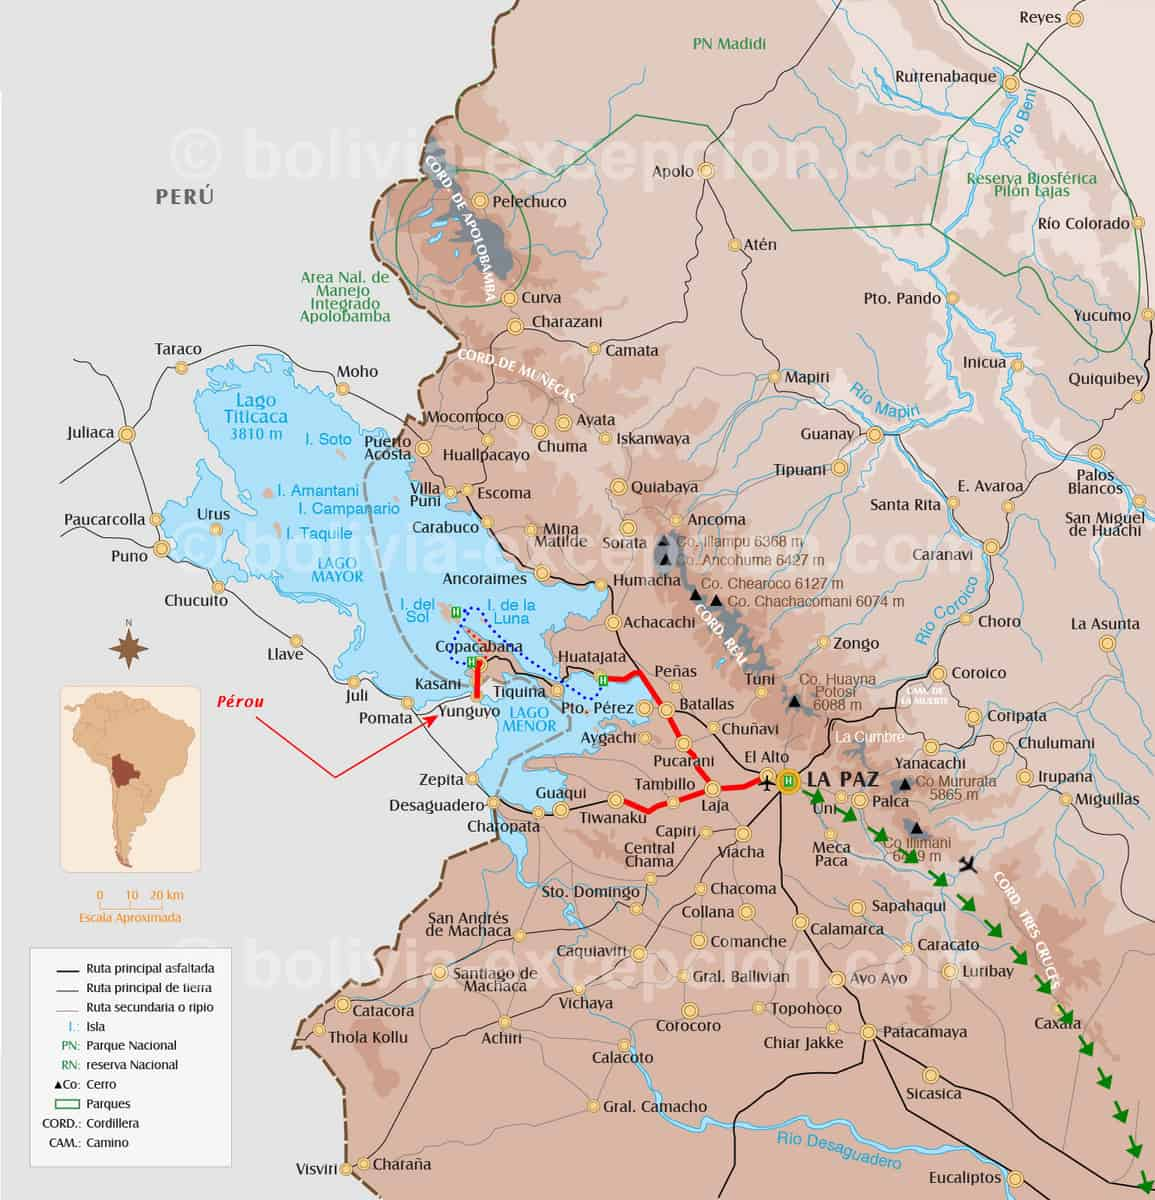 Carte La Paz Titicaca